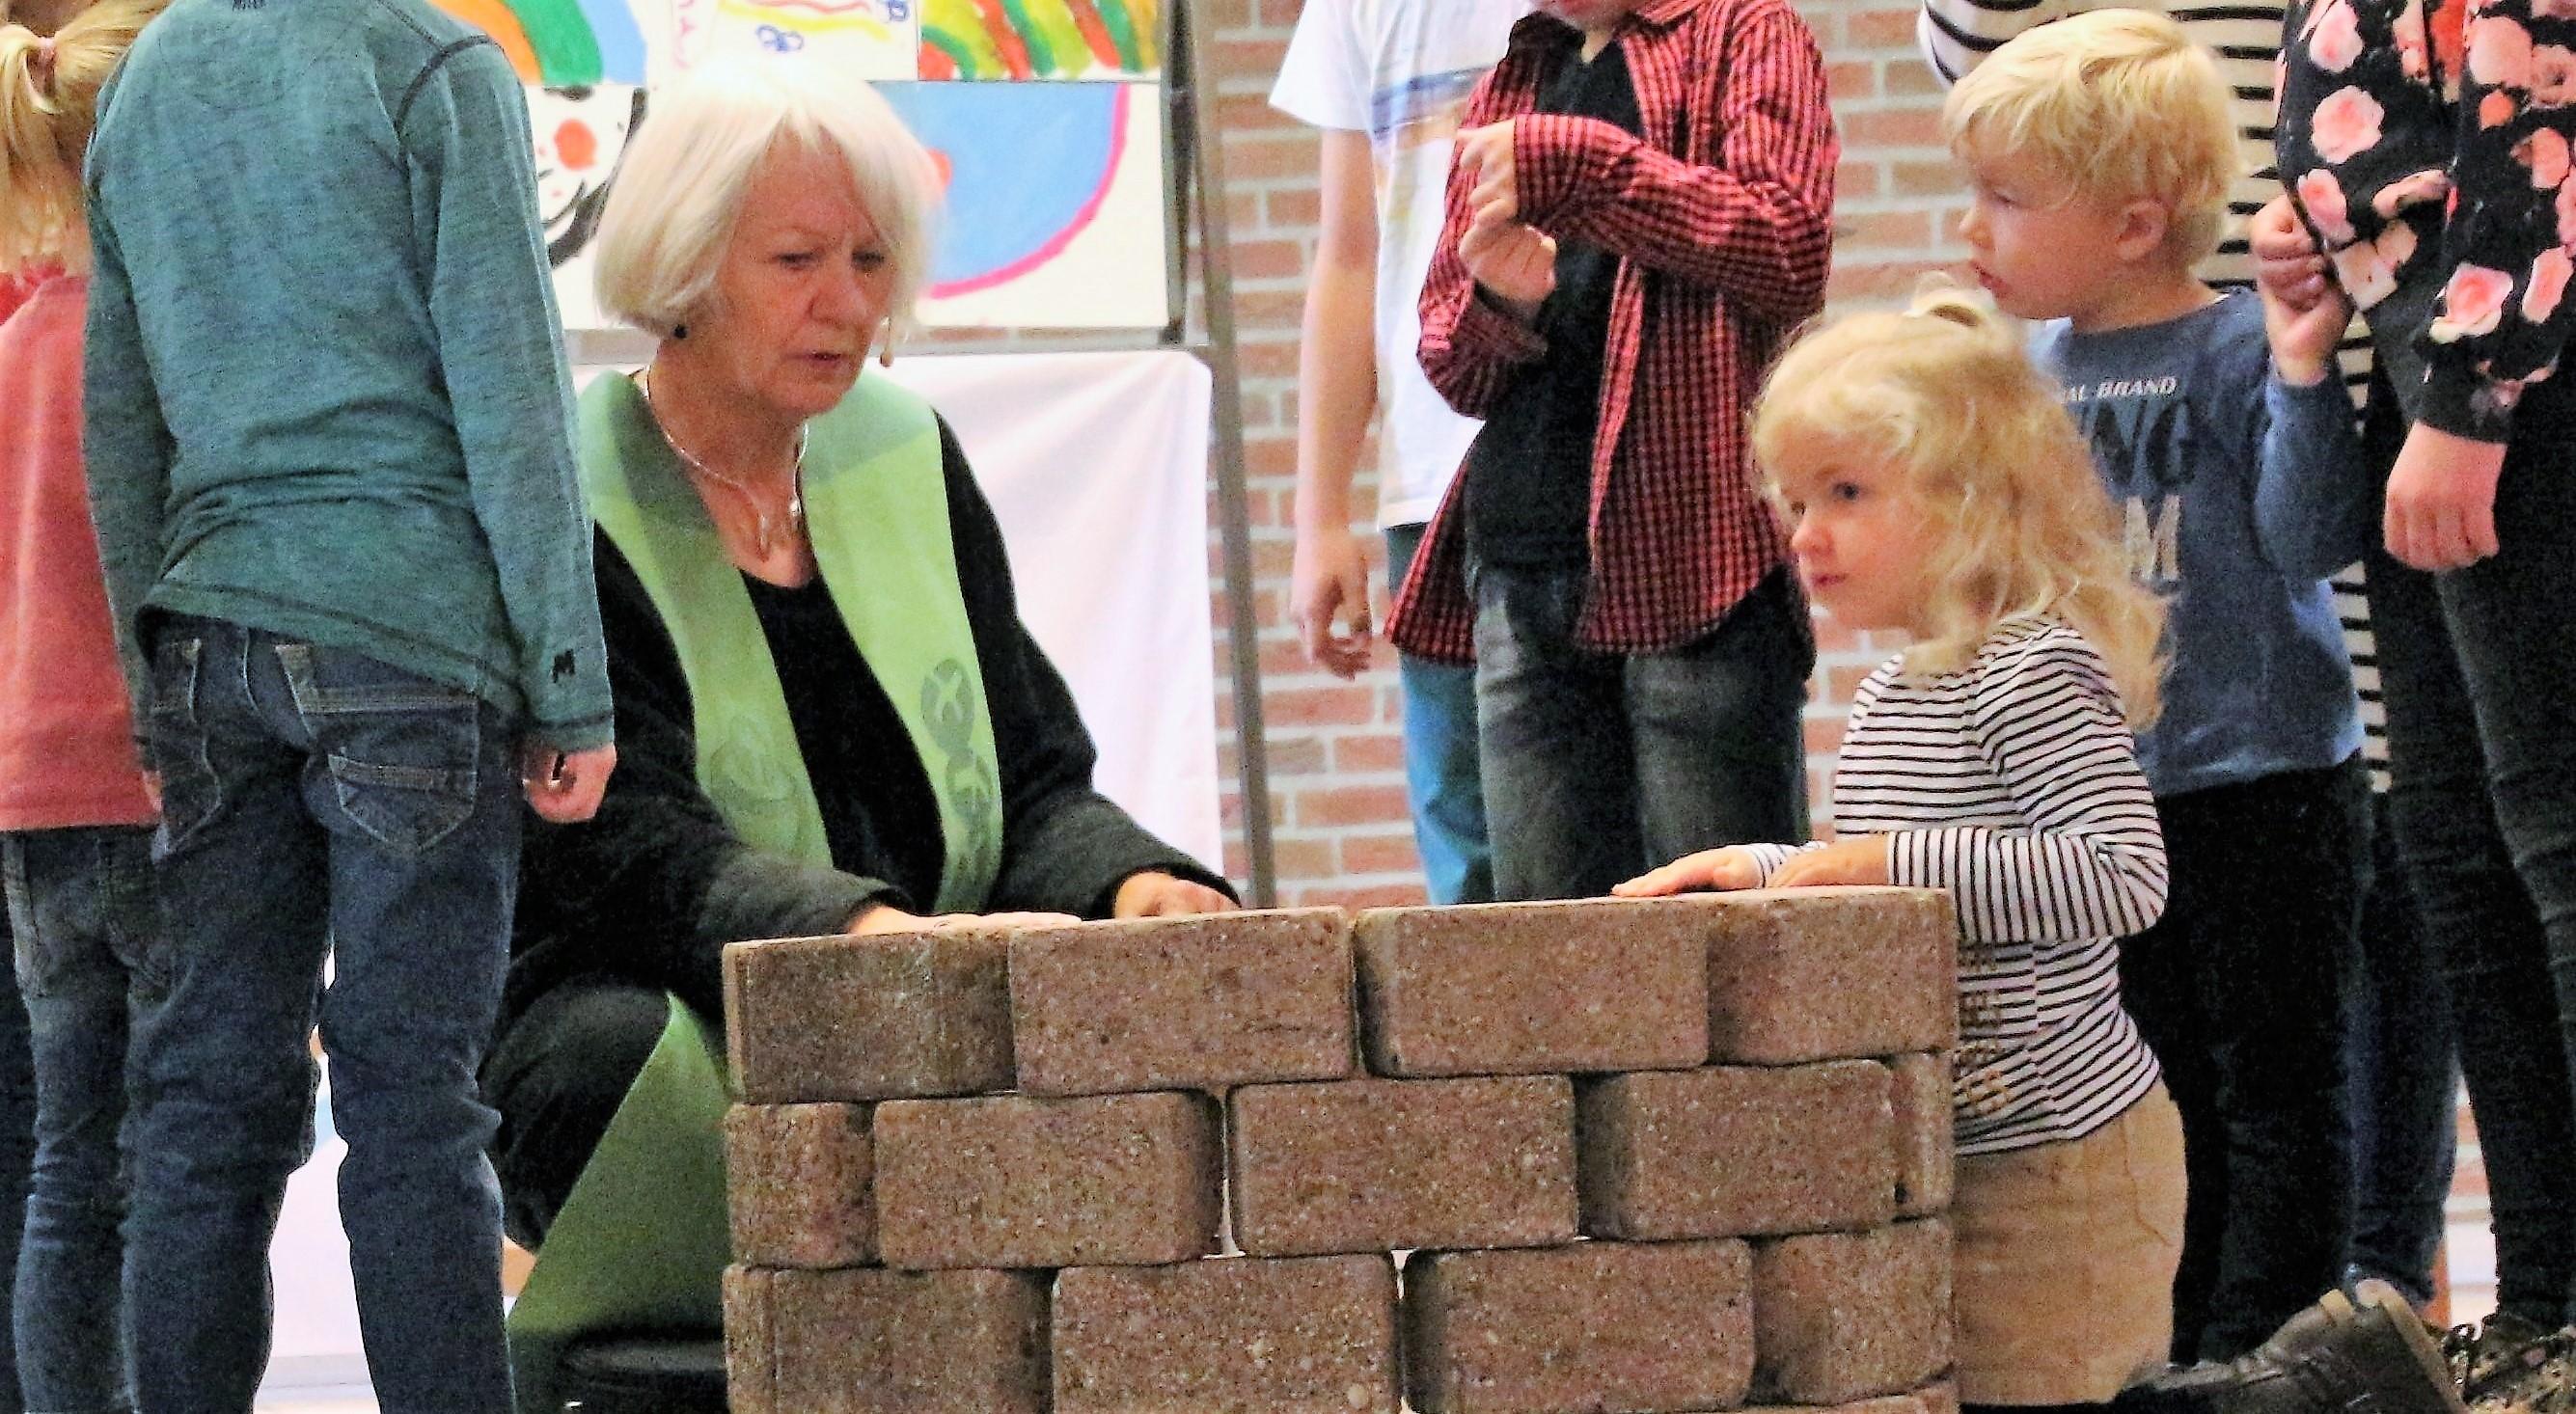 vanuit de bron vernieuwing kerk 2025 back to basics vitalisering waarderende gemeenteopbouw